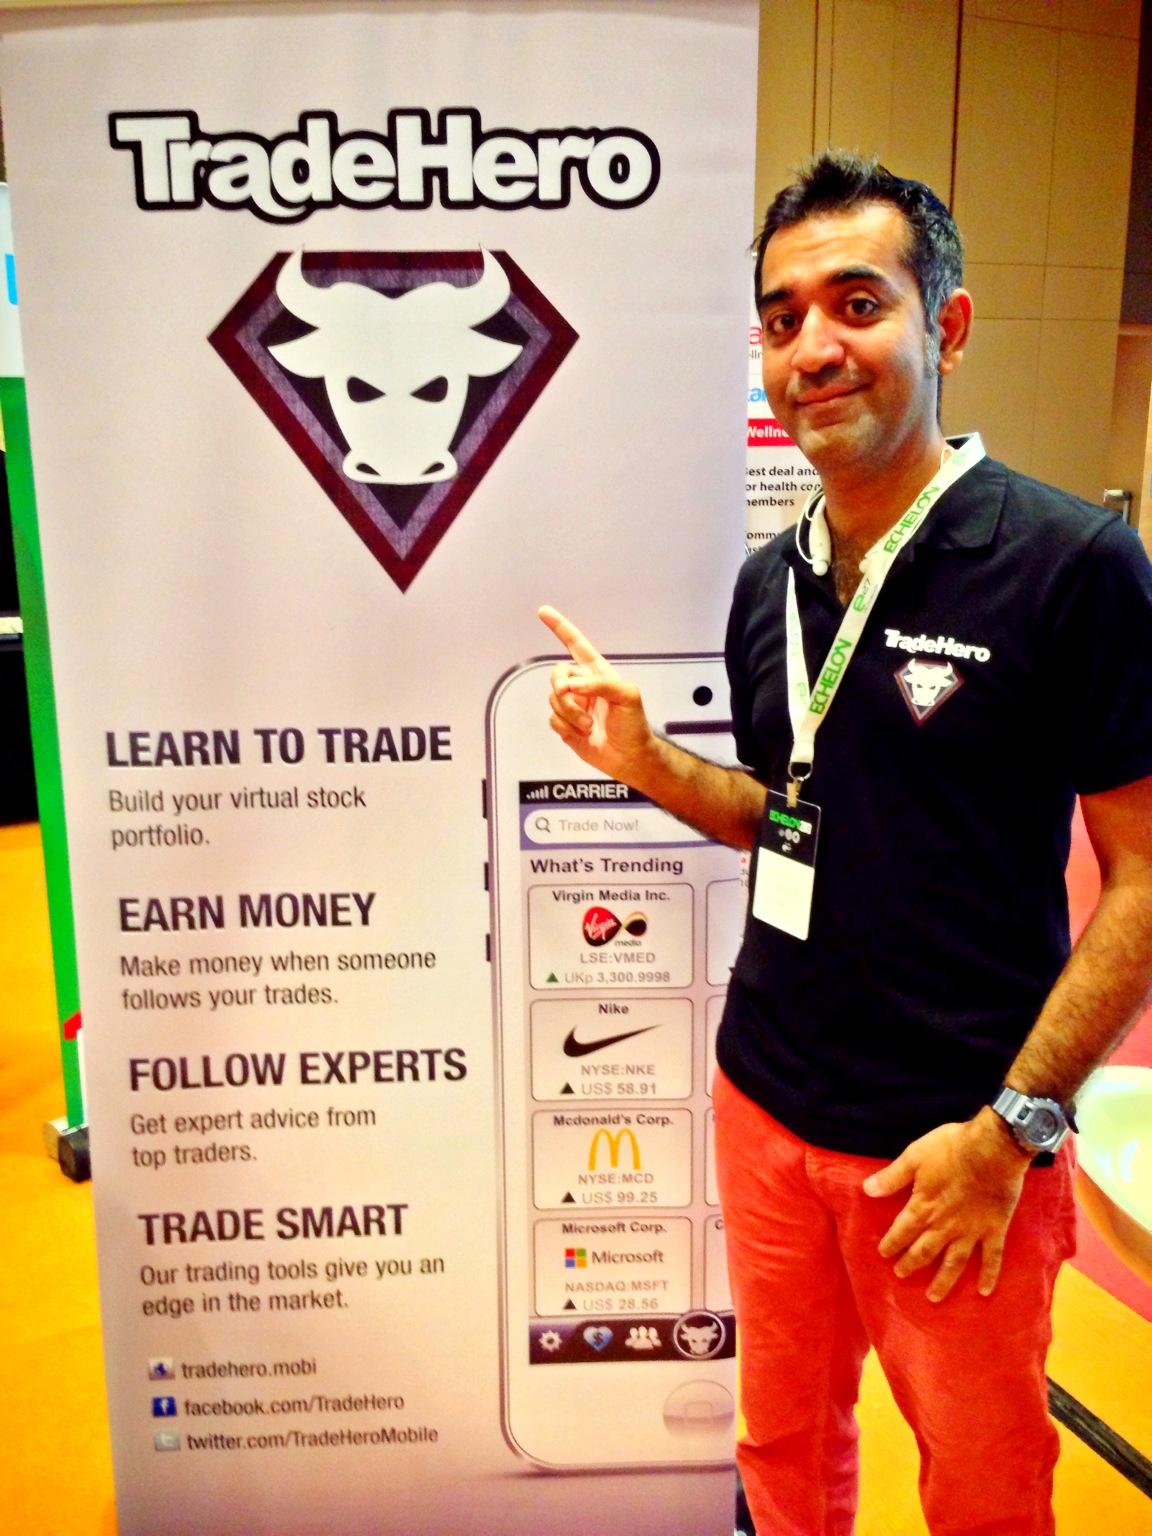 Singapore stock trading app makes a splash